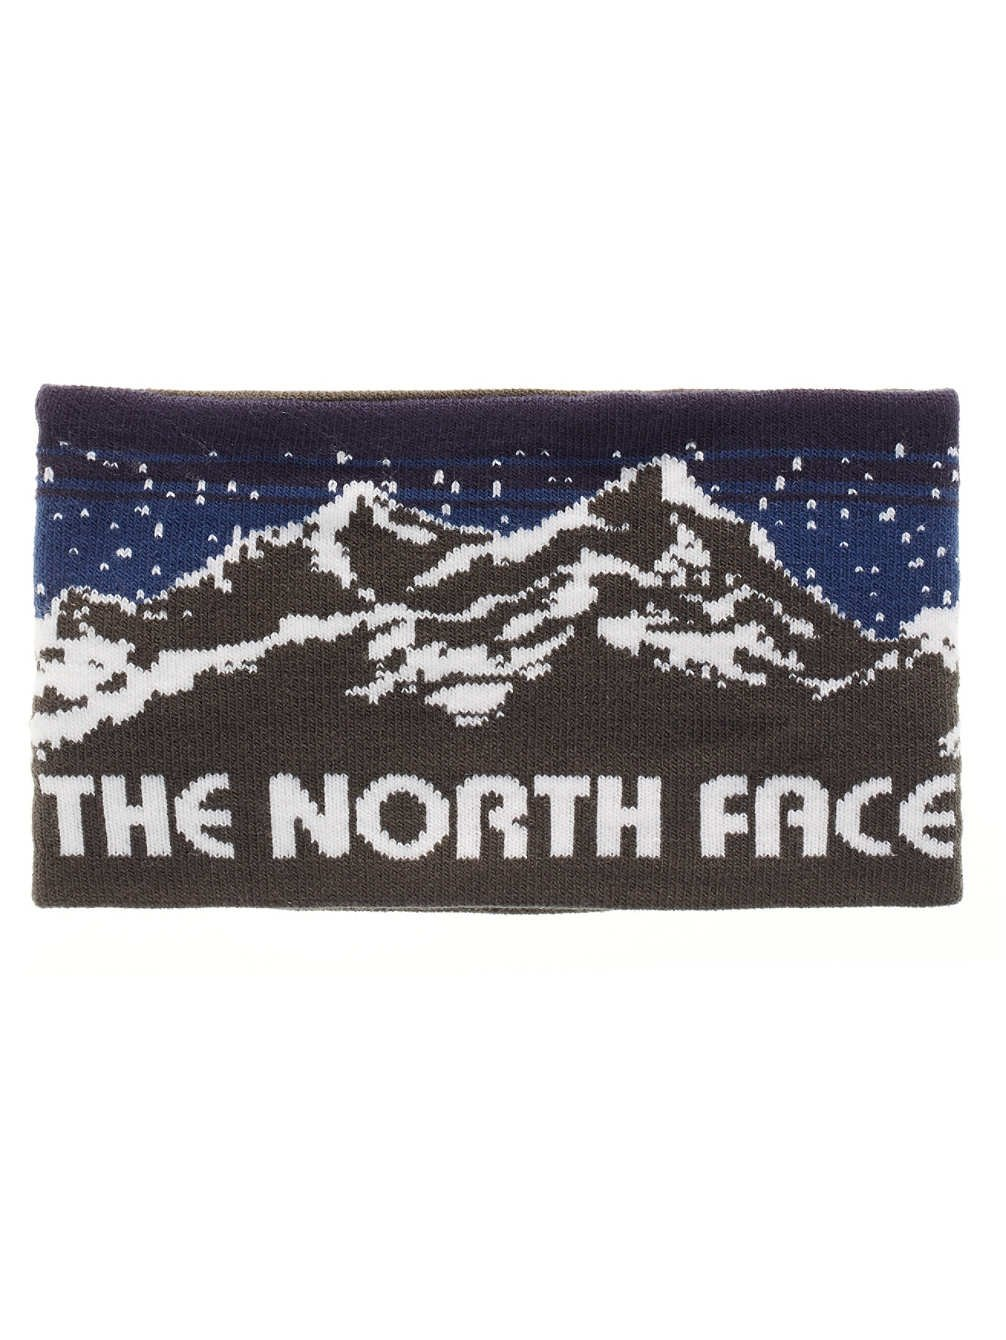 North Face chizzler Headband–Nastro Unisex, Taglia OS, Unisex Adulto, Chizzler Headband, Grigio, OS The North Face